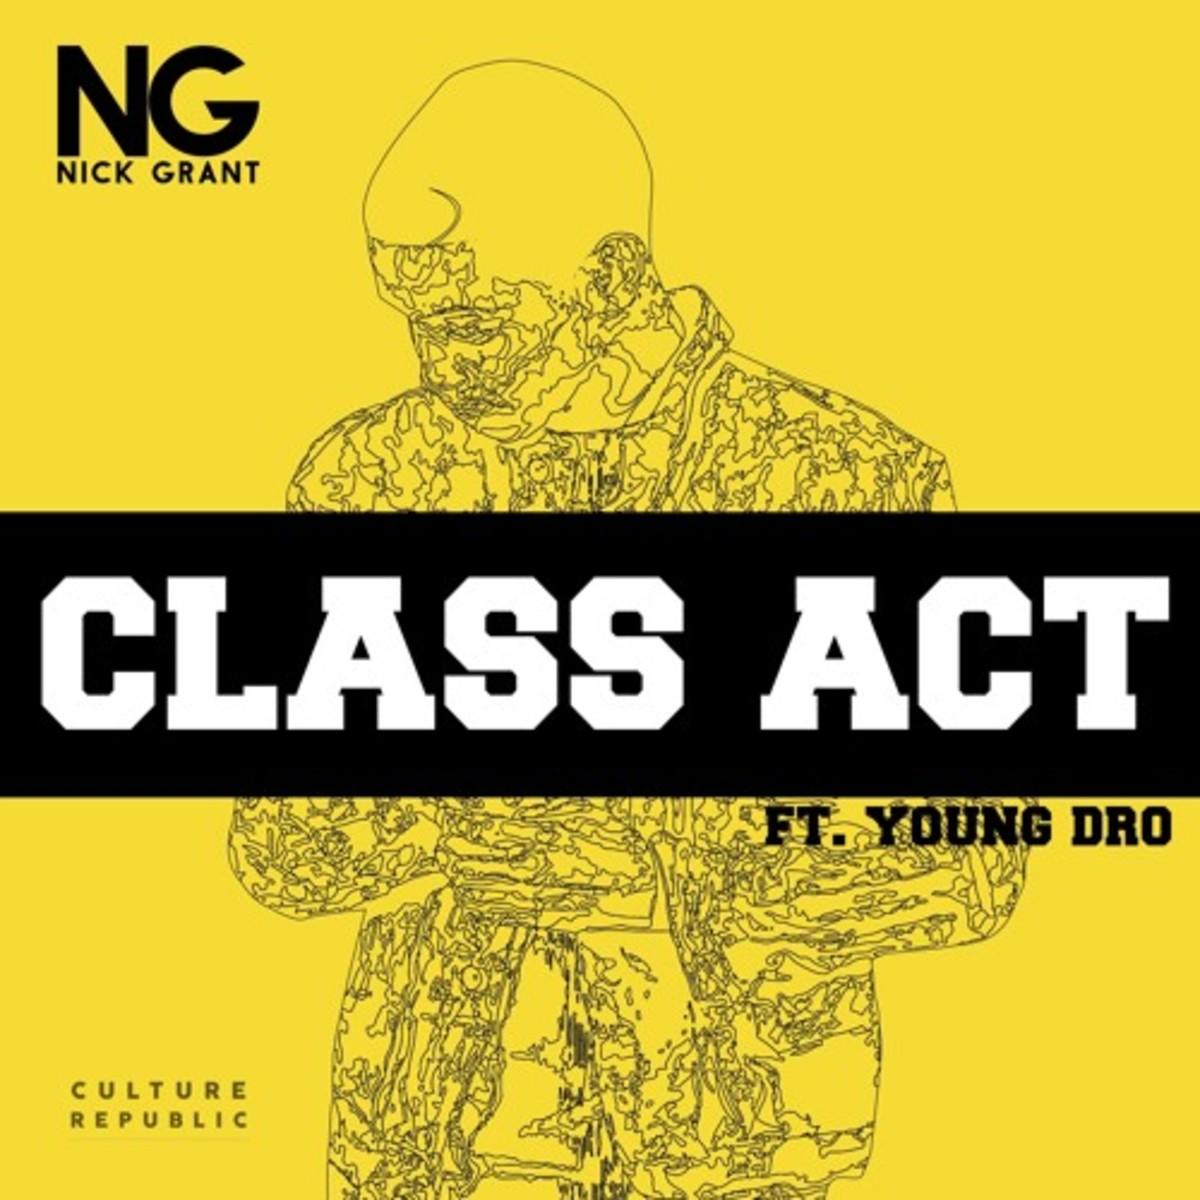 nick-grant-class-act.jpg